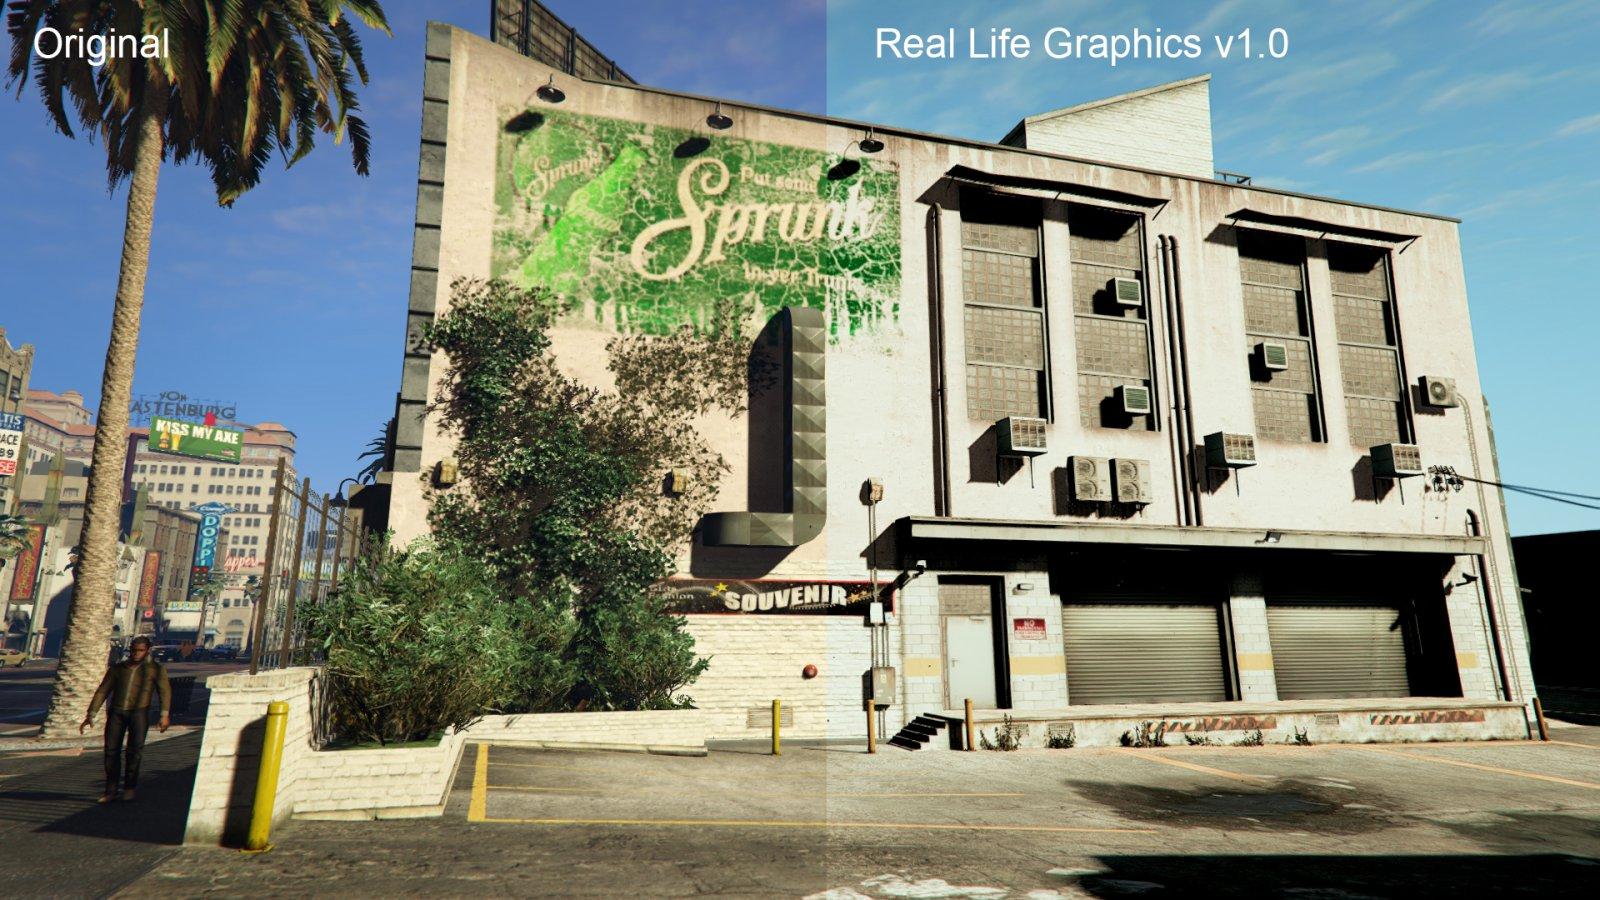 Real Life Graphics - Mods pour GTA V sur GTA Modding